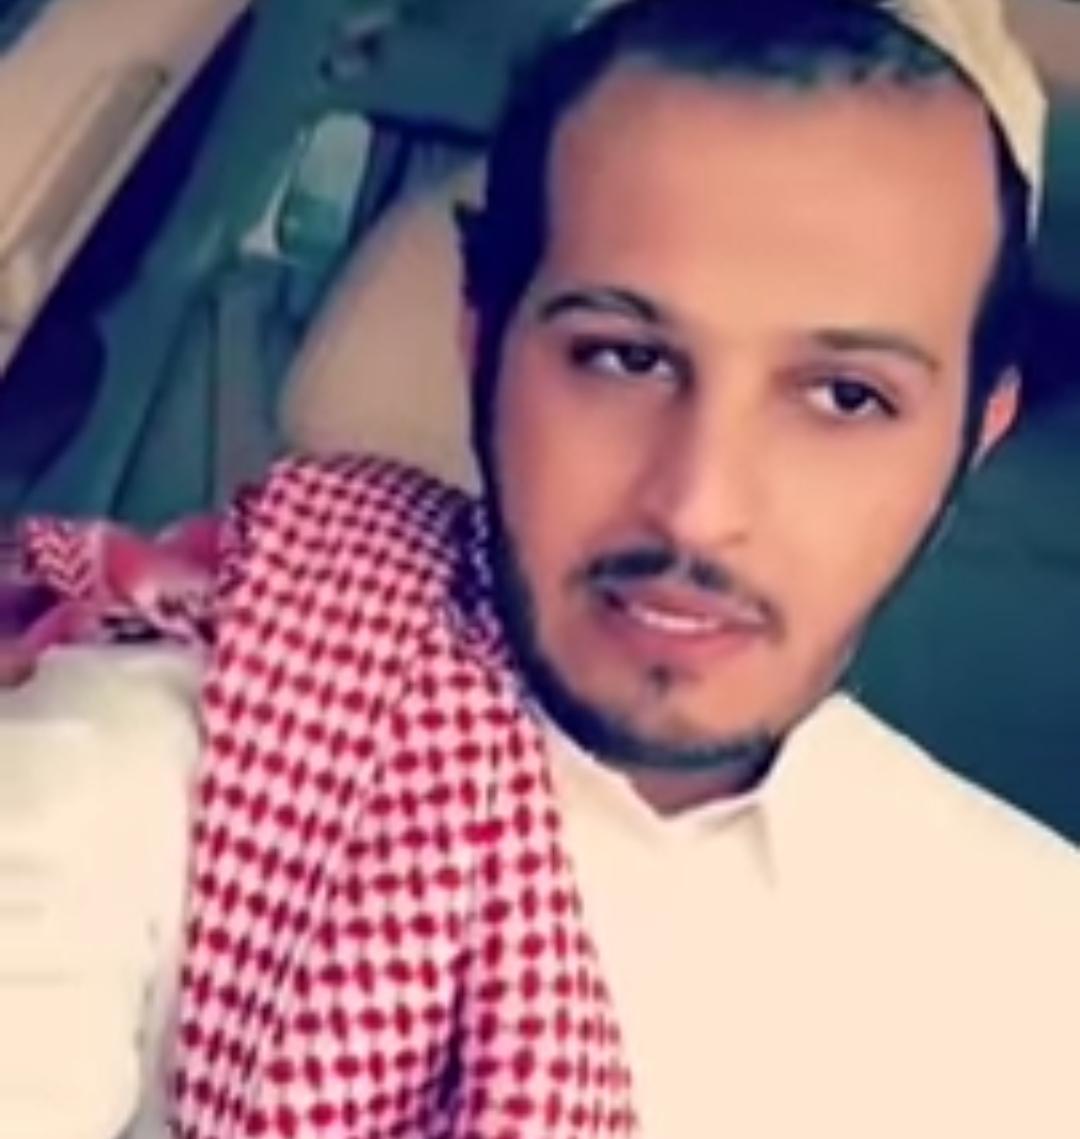 شاهد سلف خويه 200 الف ريال ونصب عليه شوفو وش صار ؟!